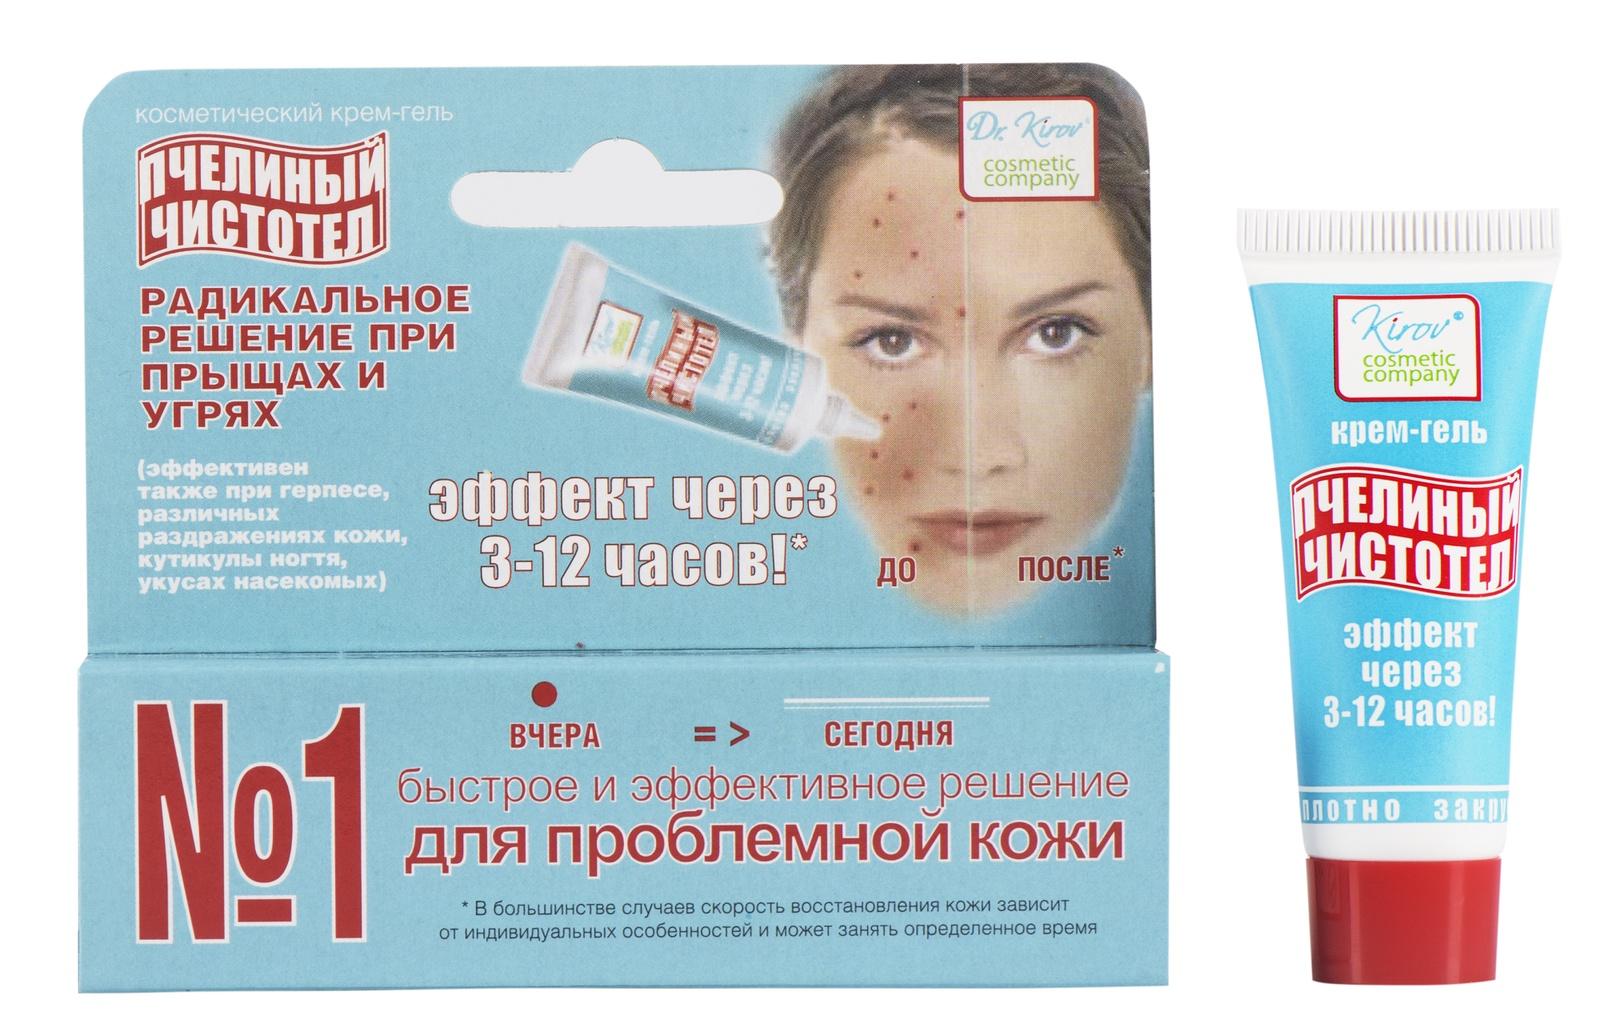 Dr. Kirov Cosmetic Company,Крем-гель